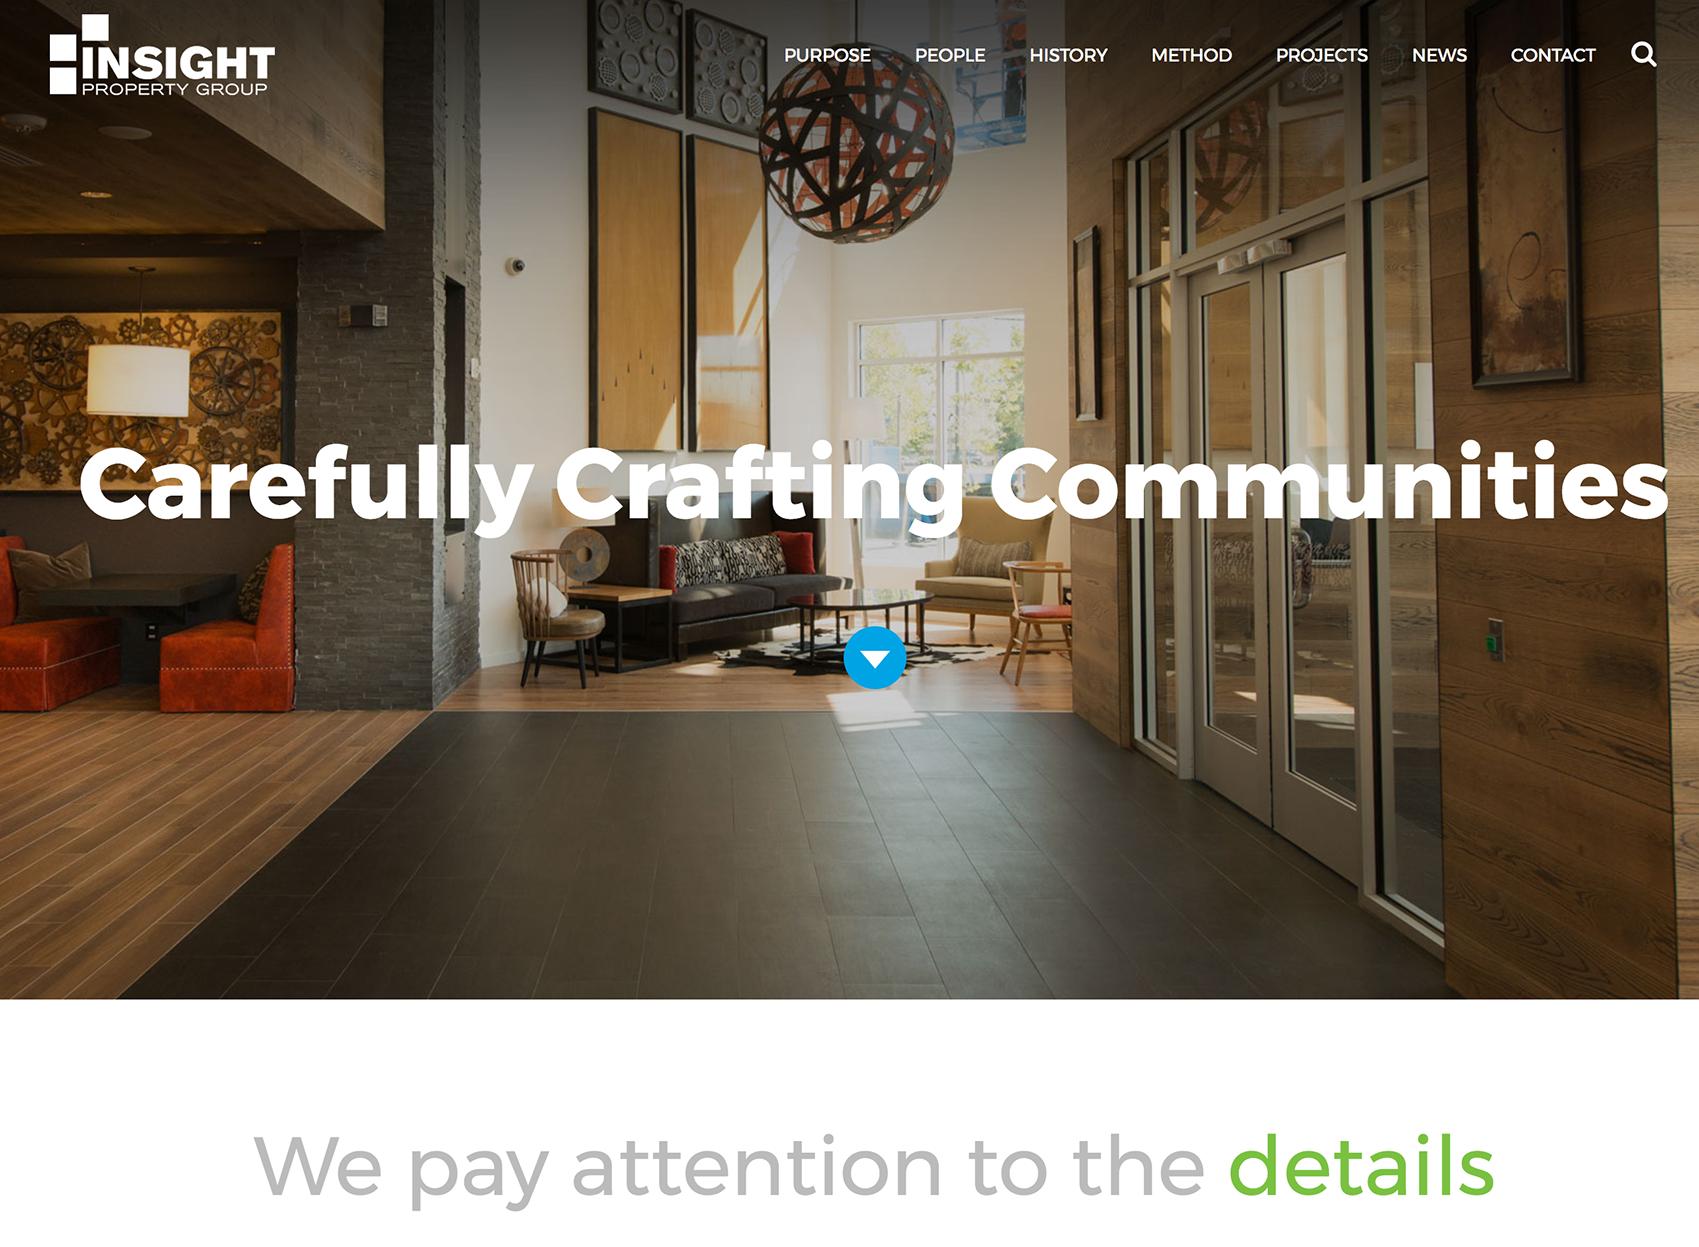 Insight Property Group